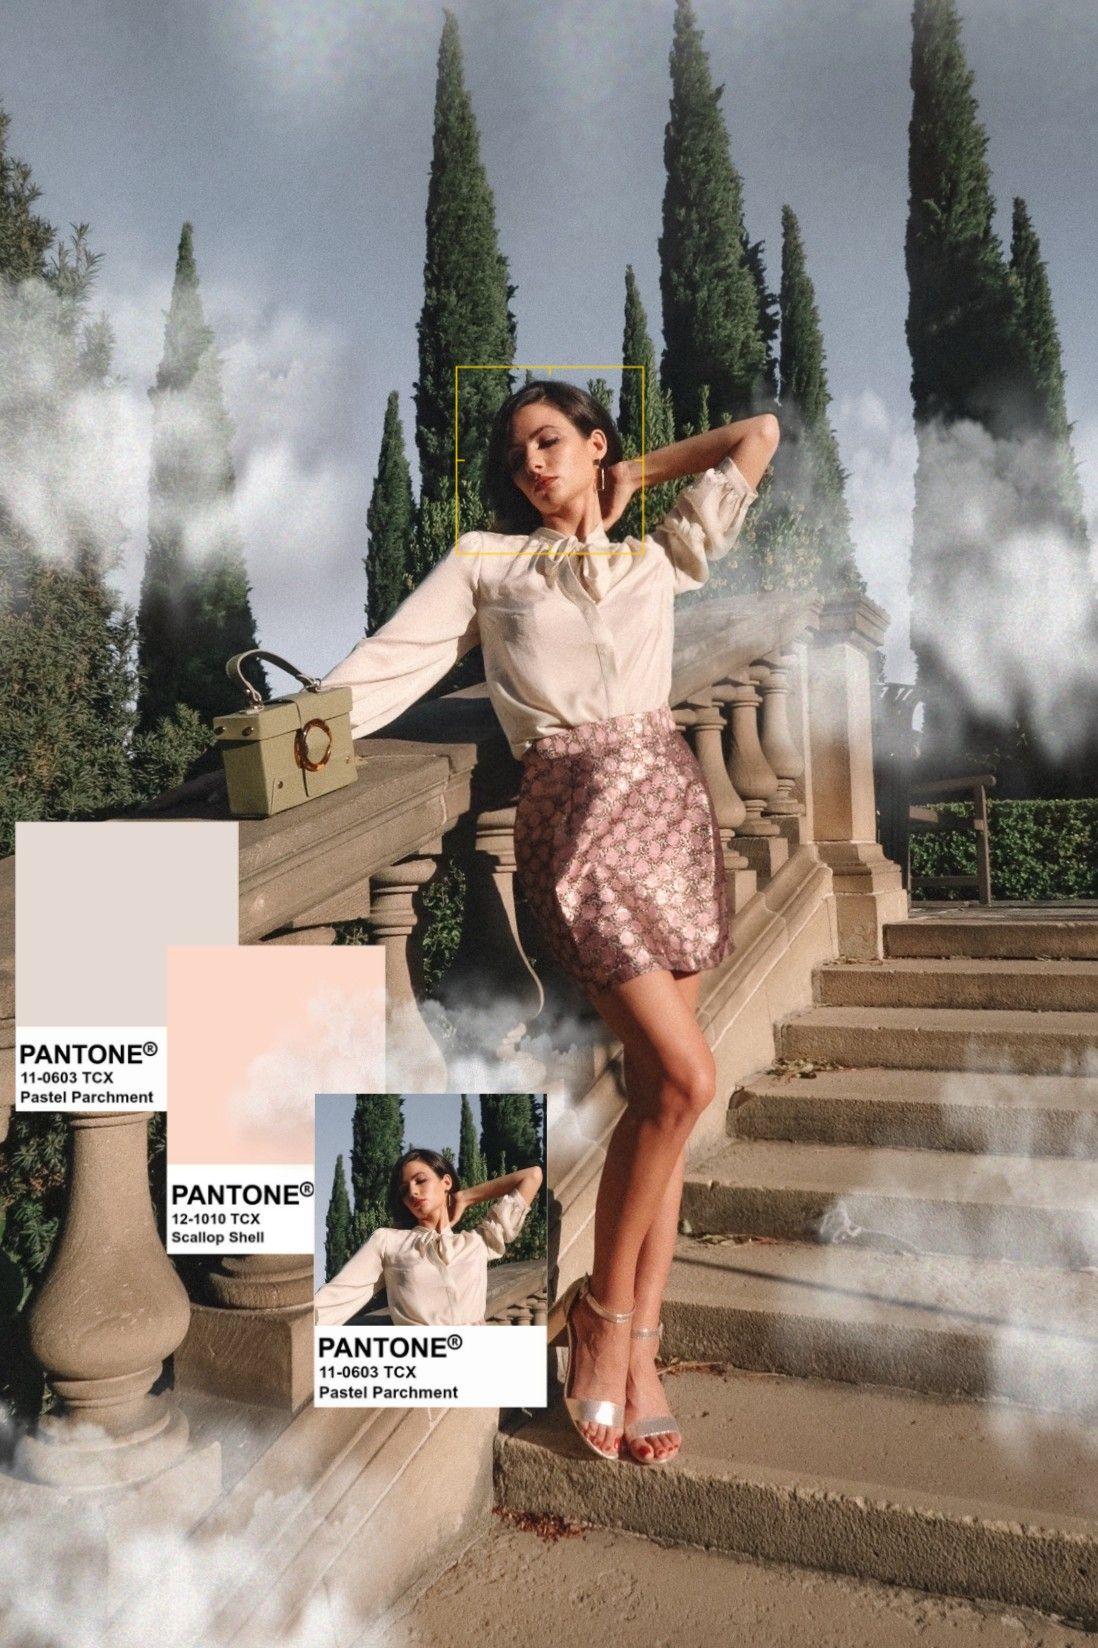 How To Make Aesthetic Edits Picsart Tutorial Editing Pictures Picsart Tutorial Picture Editing Apps